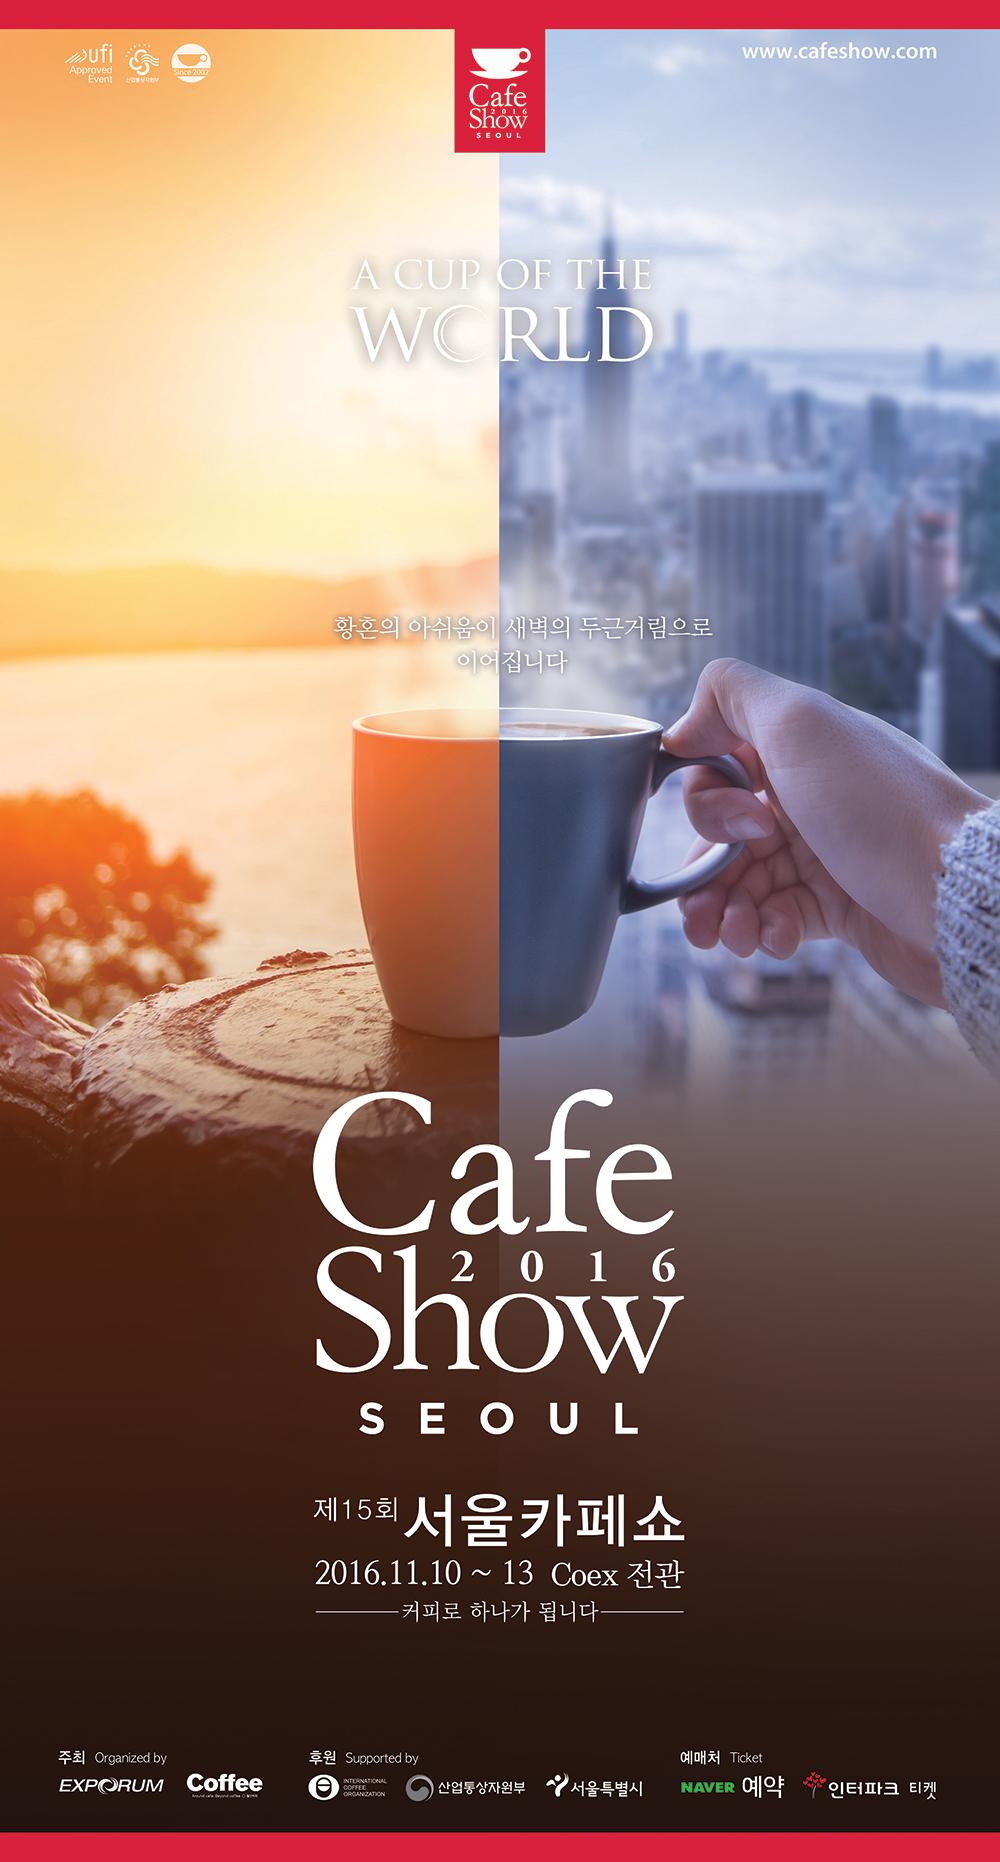 [Cafe Show Seoul 2016] 공식포스터 (4).jpg